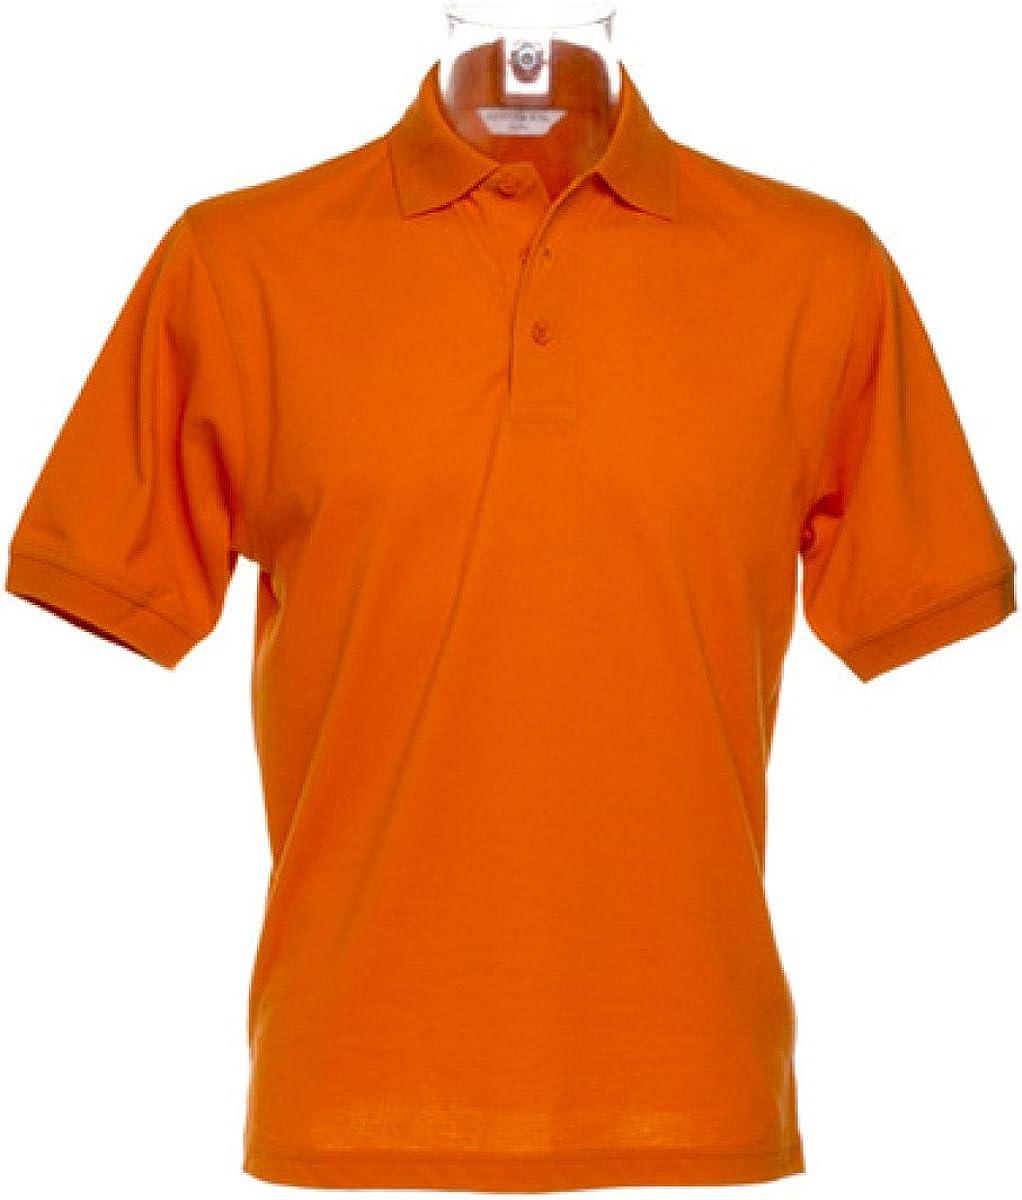 Adult Top Kustom Kit Men/'s Slim Fit Short Sleeved Superwash® Polo Shirt